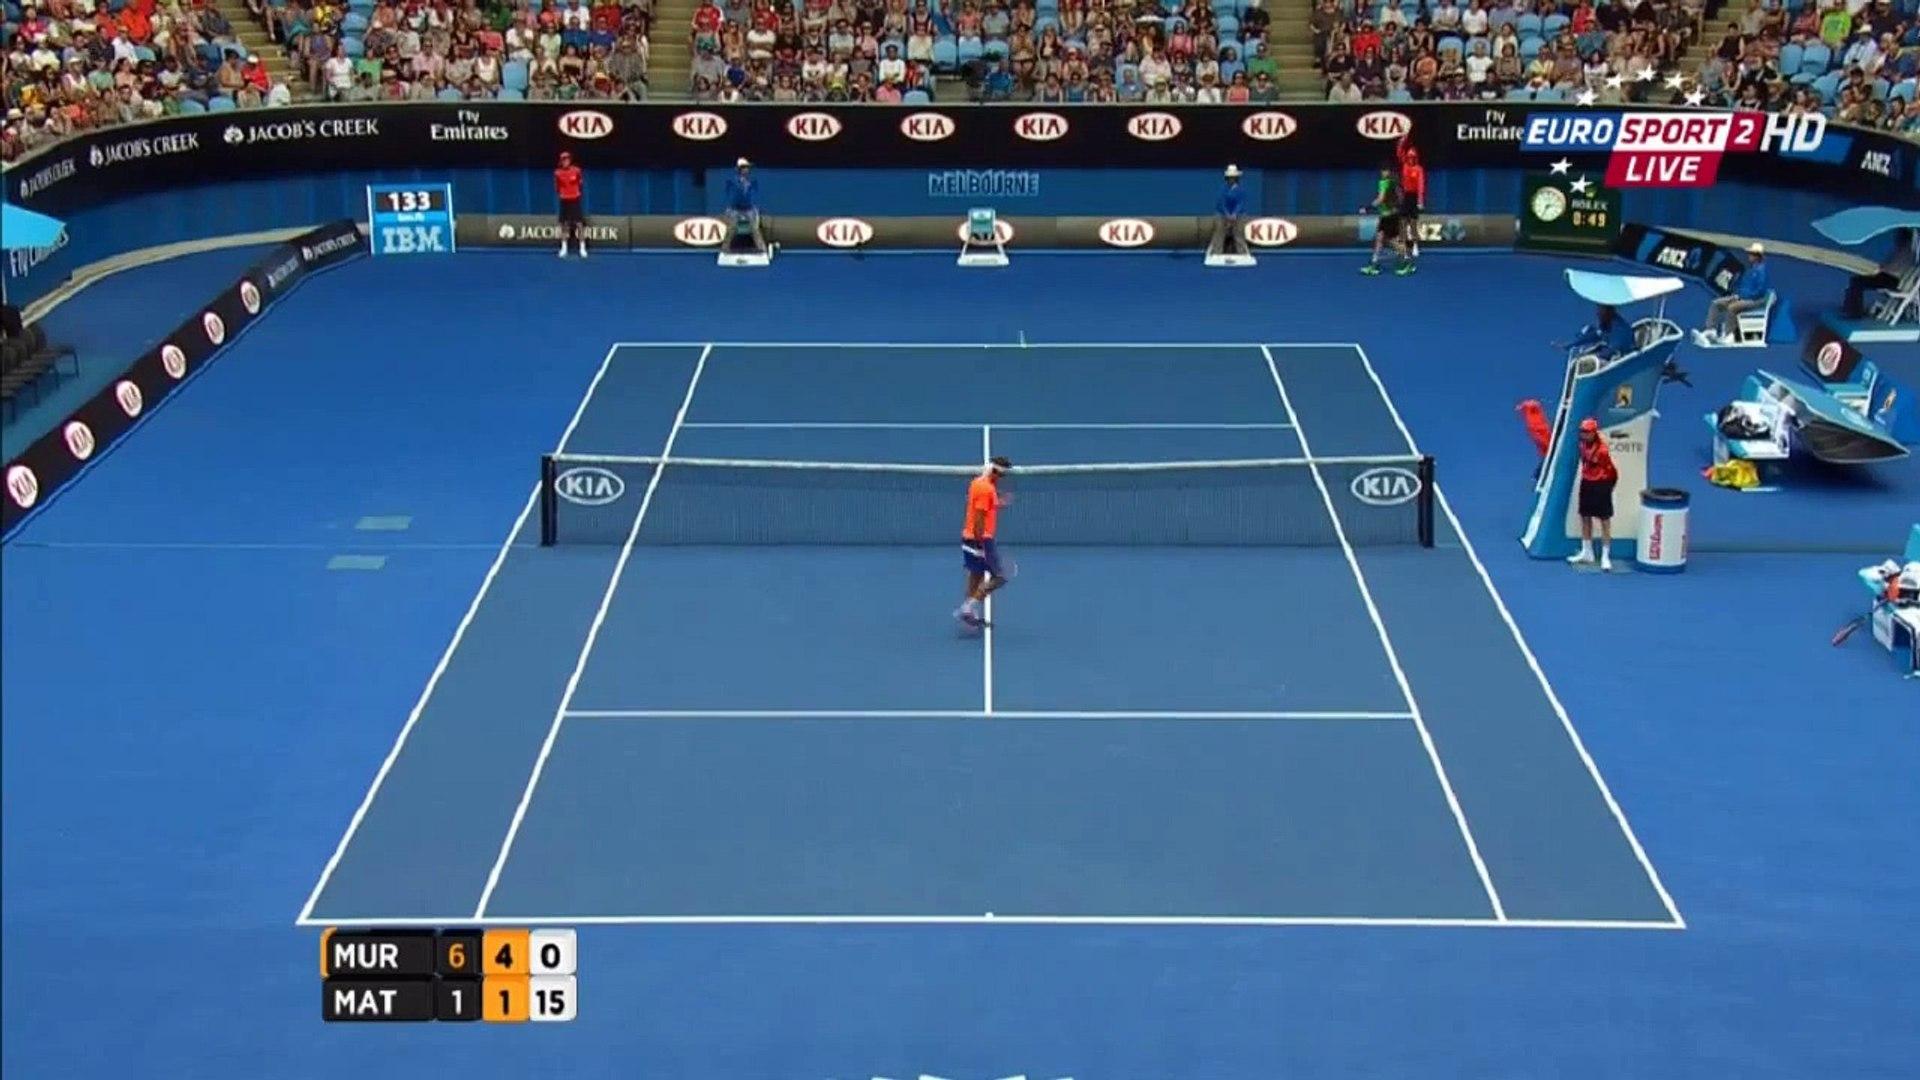 Andy Murray vs Marinko Matosevic Australian Open 2015 2nd Round Highlights HD